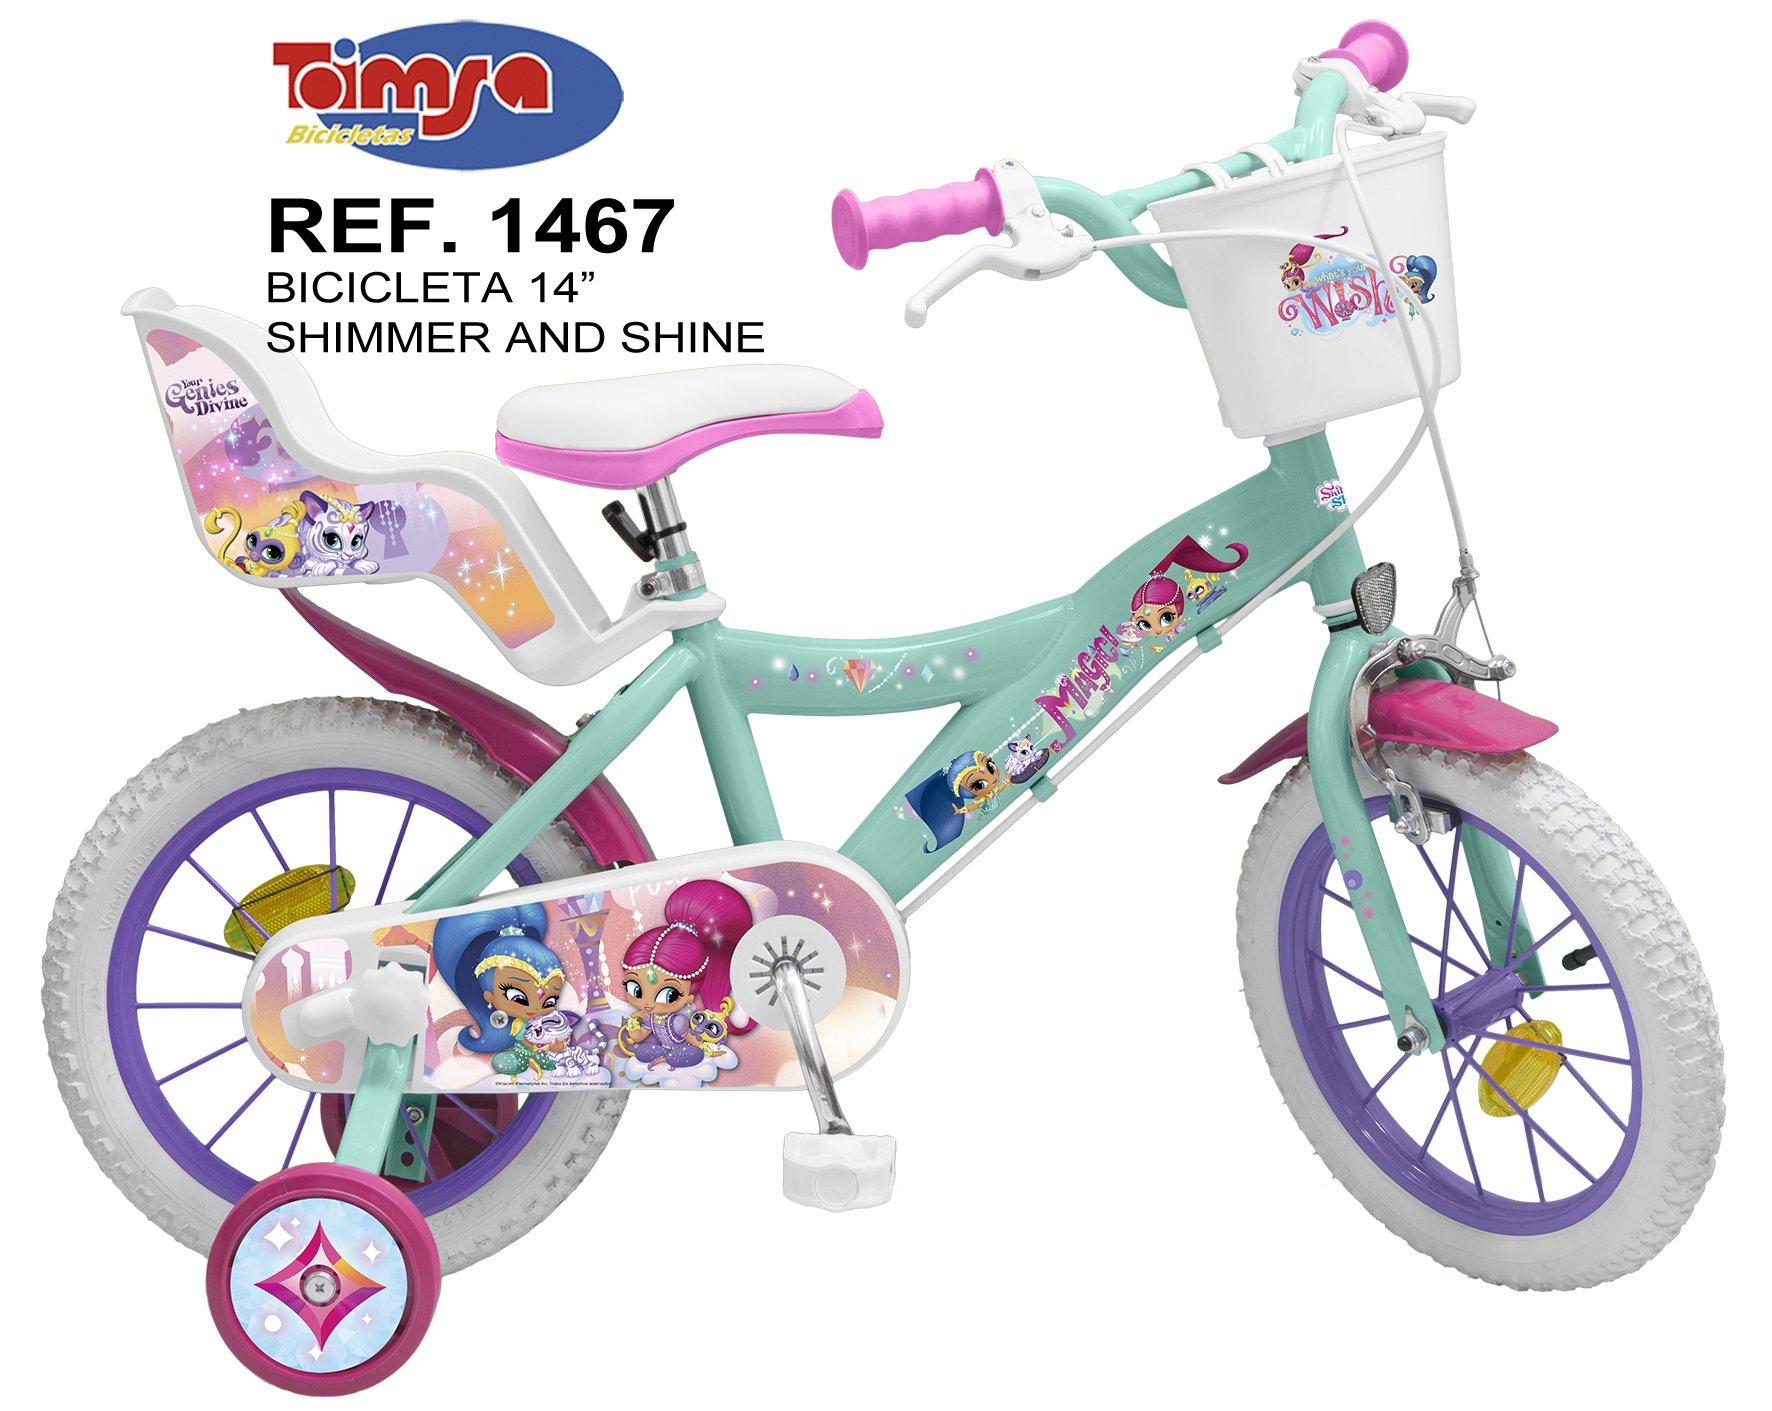 Bicicleta Shimmer and Shine 14 pulgadas